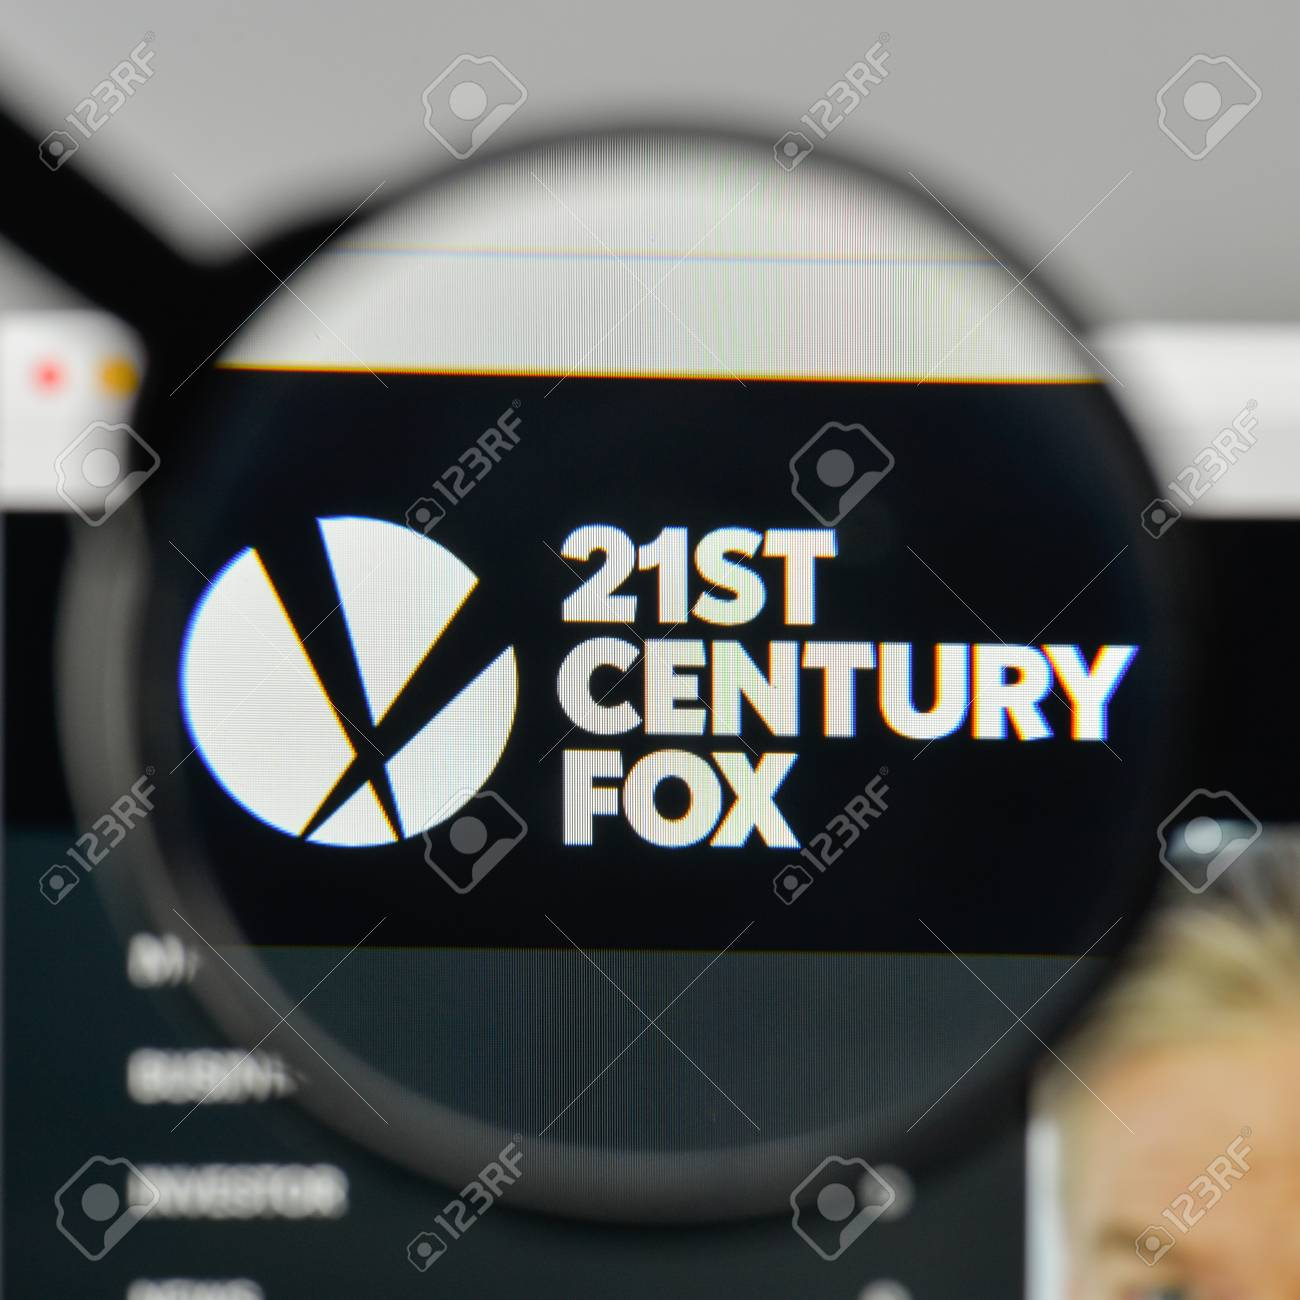 Milan, Italy - November 1, 2017: 21st Century Fox logo on the website  homepage